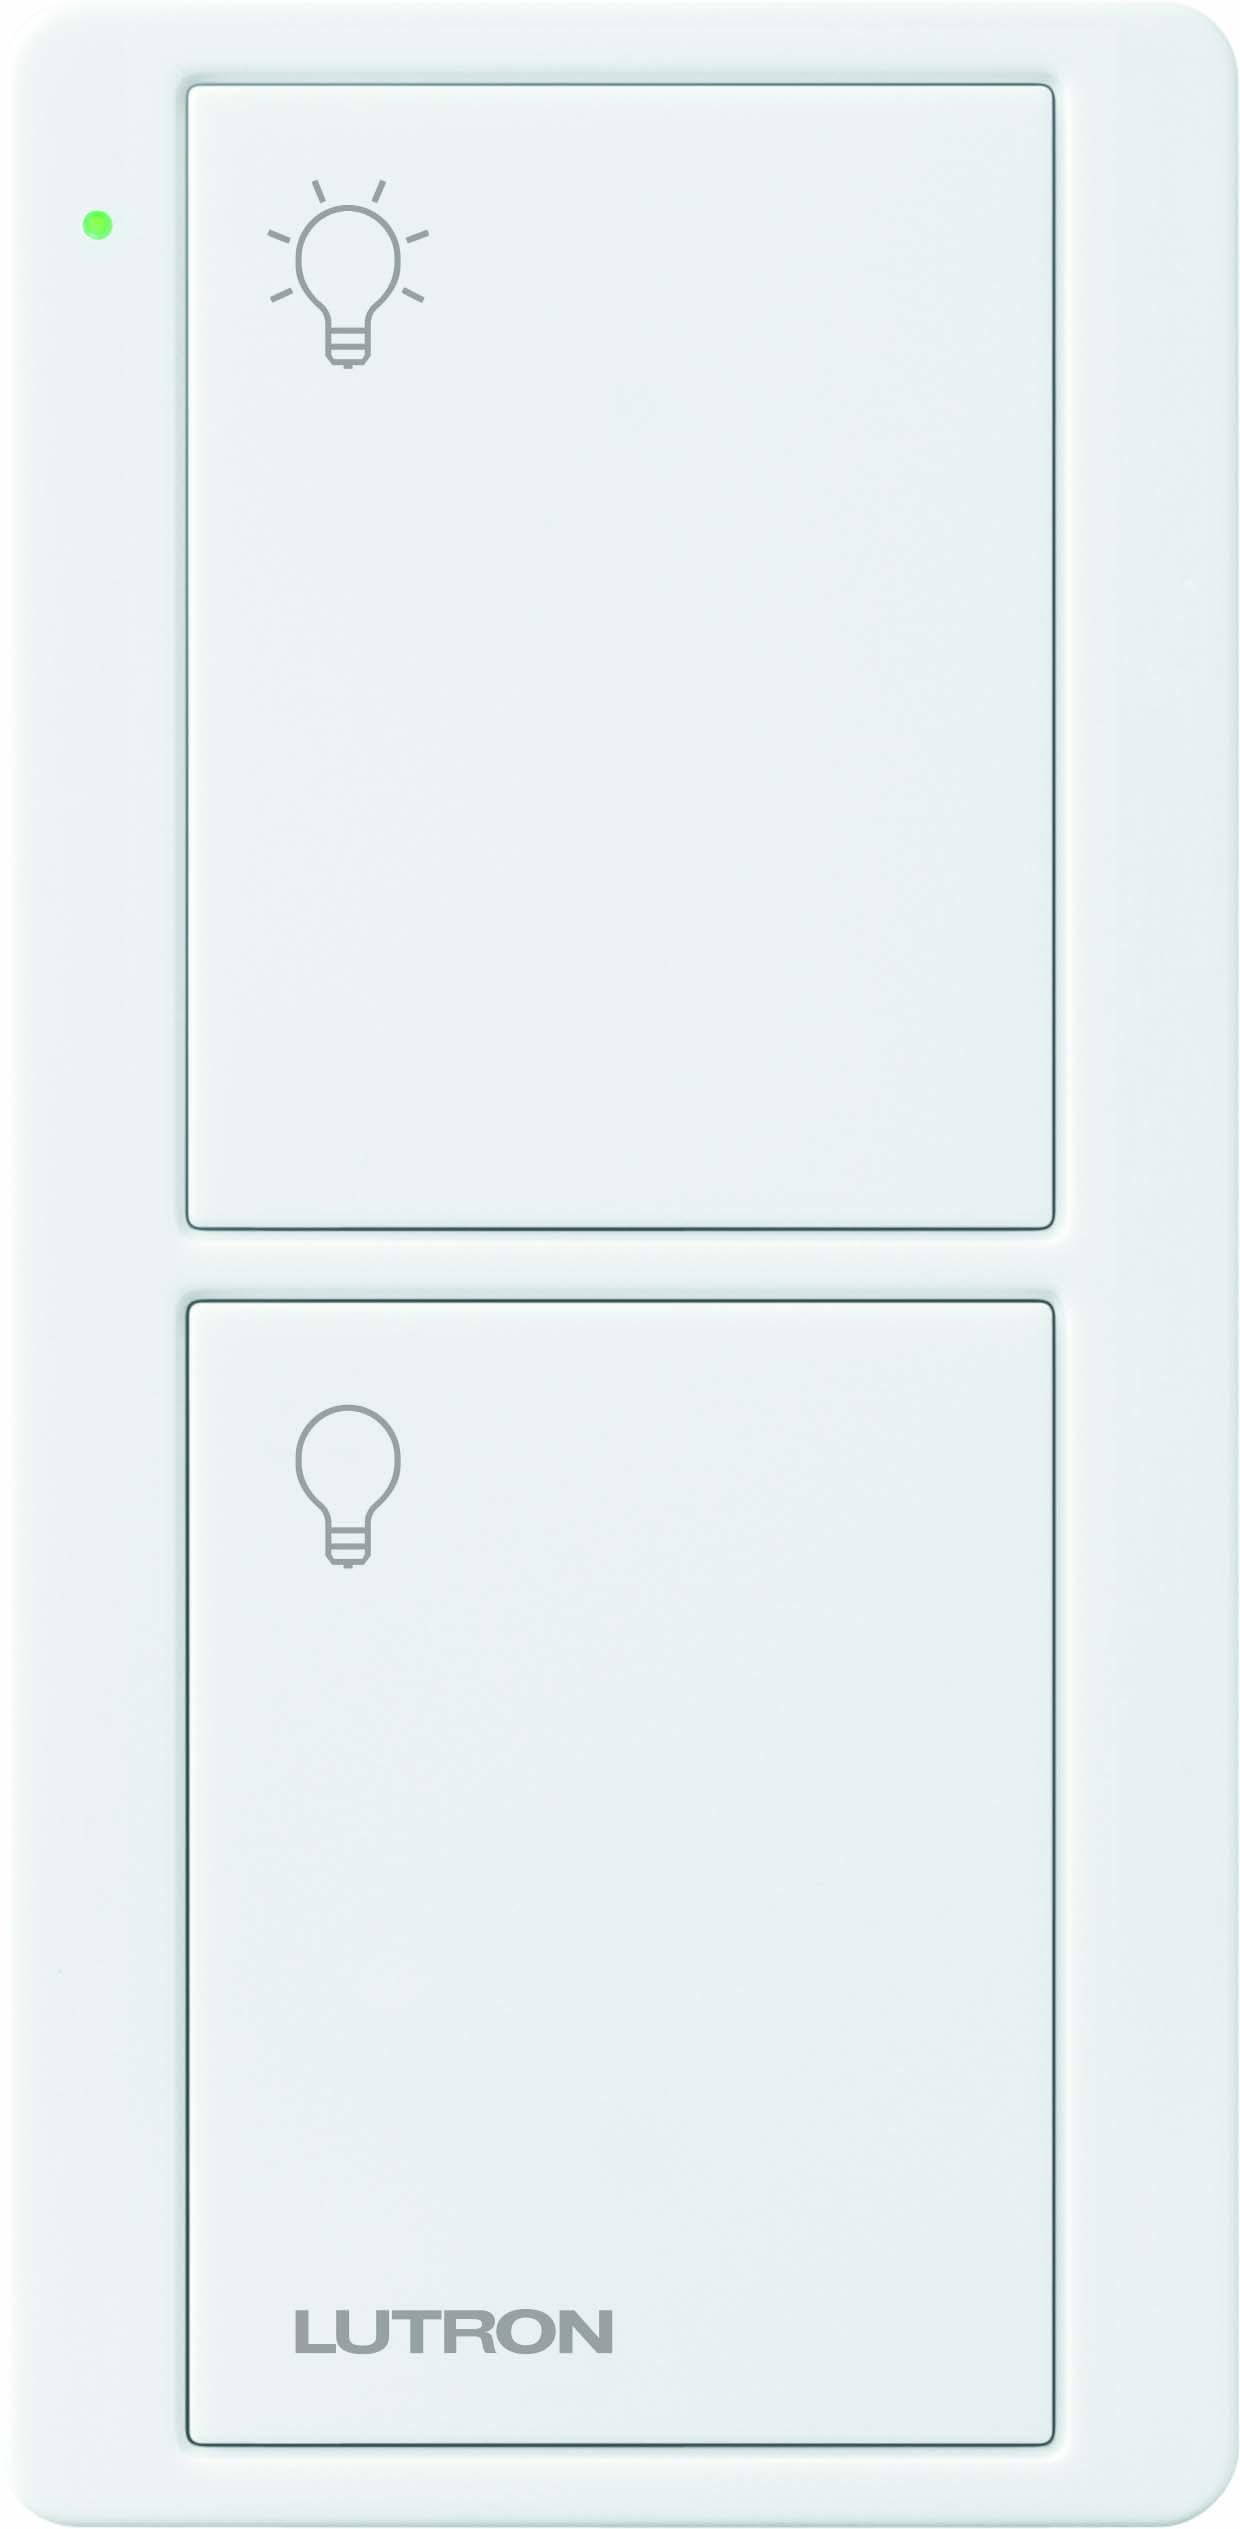 Lutron,PJ2-2B-GWH-L01,Pico® PJ2-2B-GWH-L01 Wireless Lighting Control Switch, 3 VDC, White